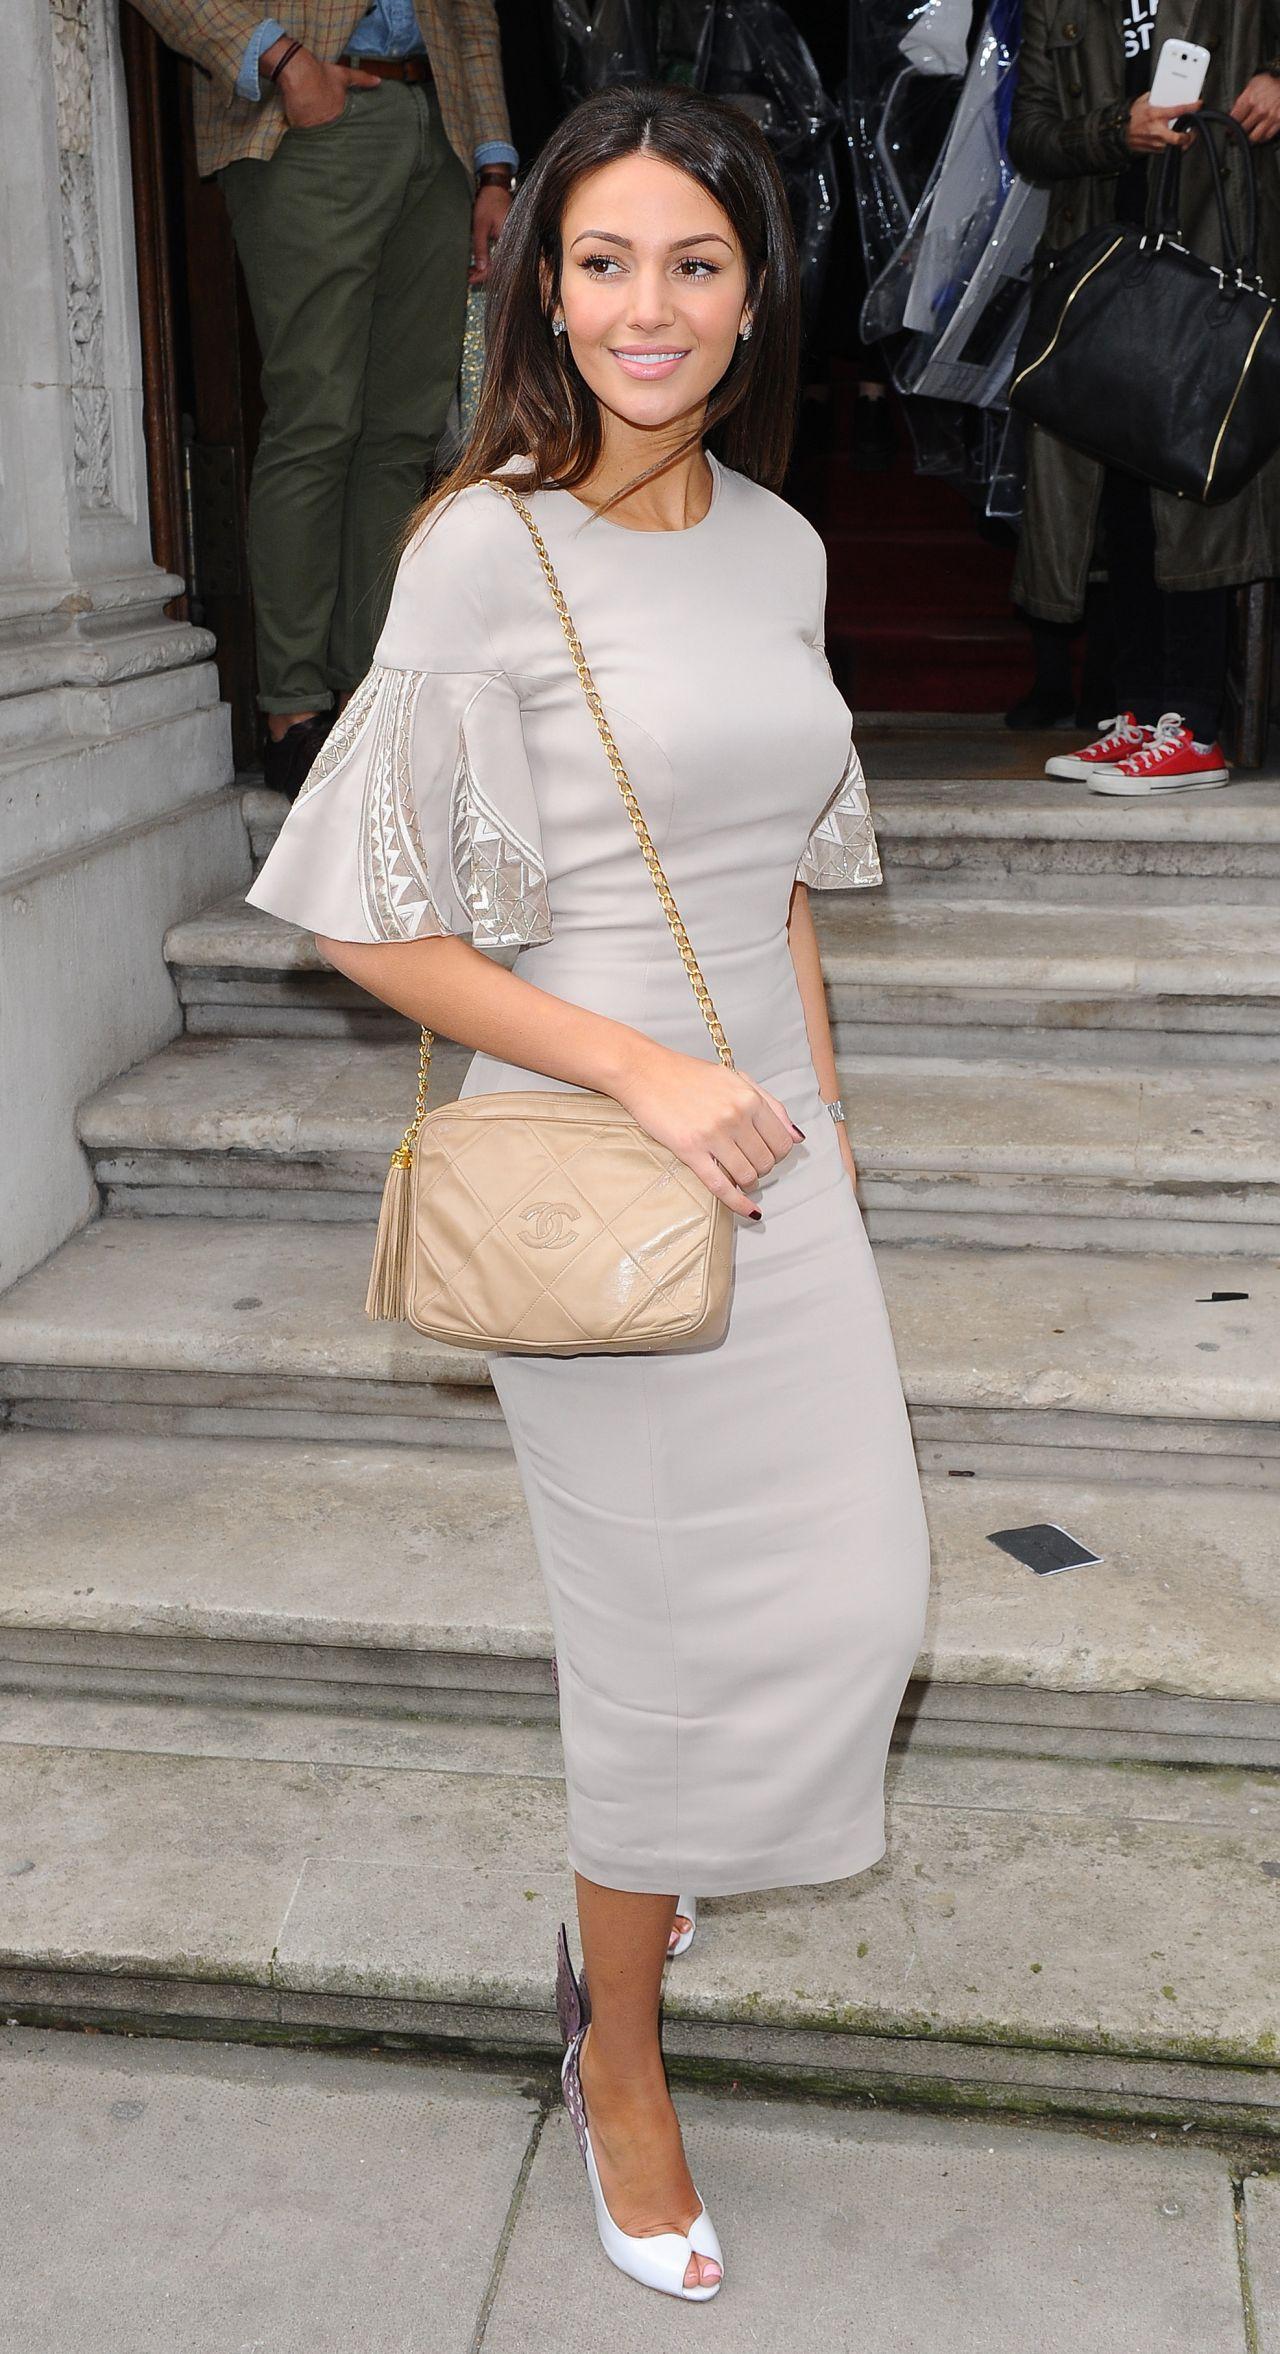 Michelle Keegan at Julien Macdonald Show - London Fashion Week, February 2015